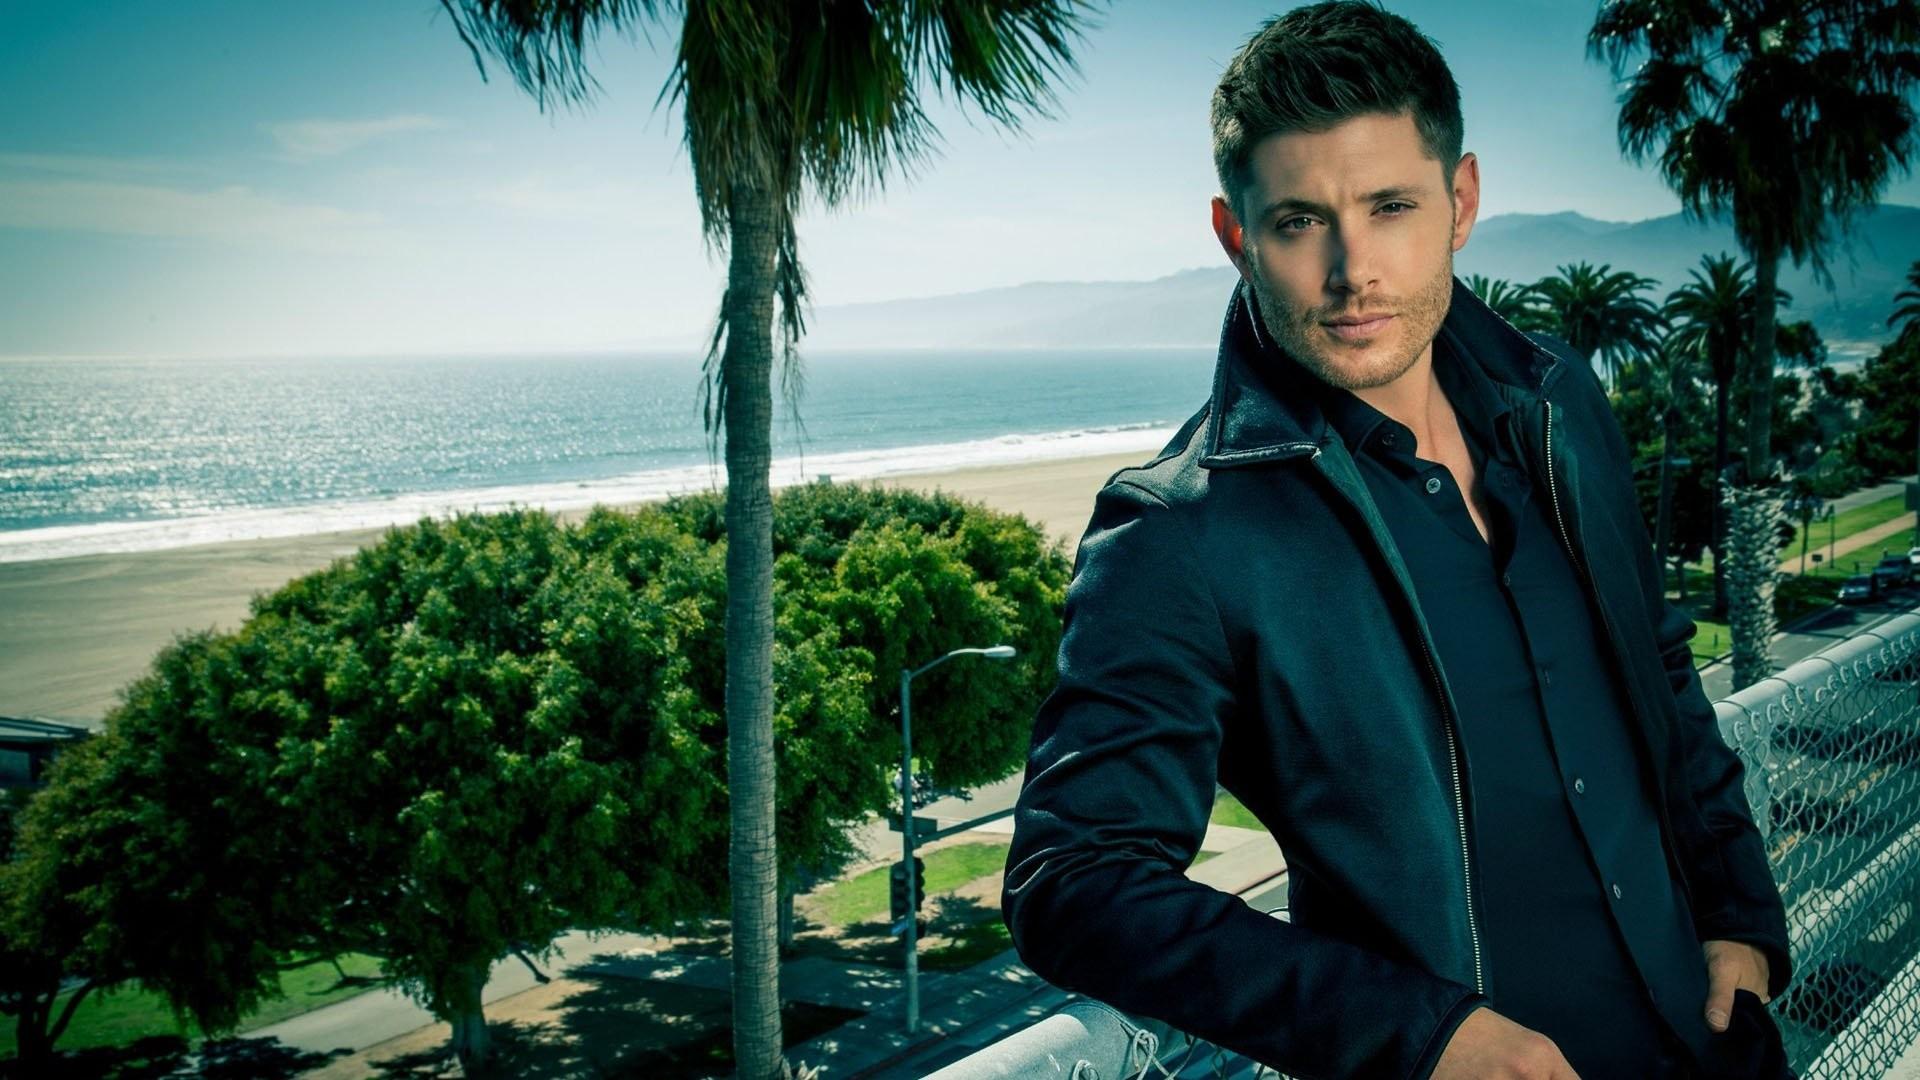 Jensen Ackles Wallpaper Free